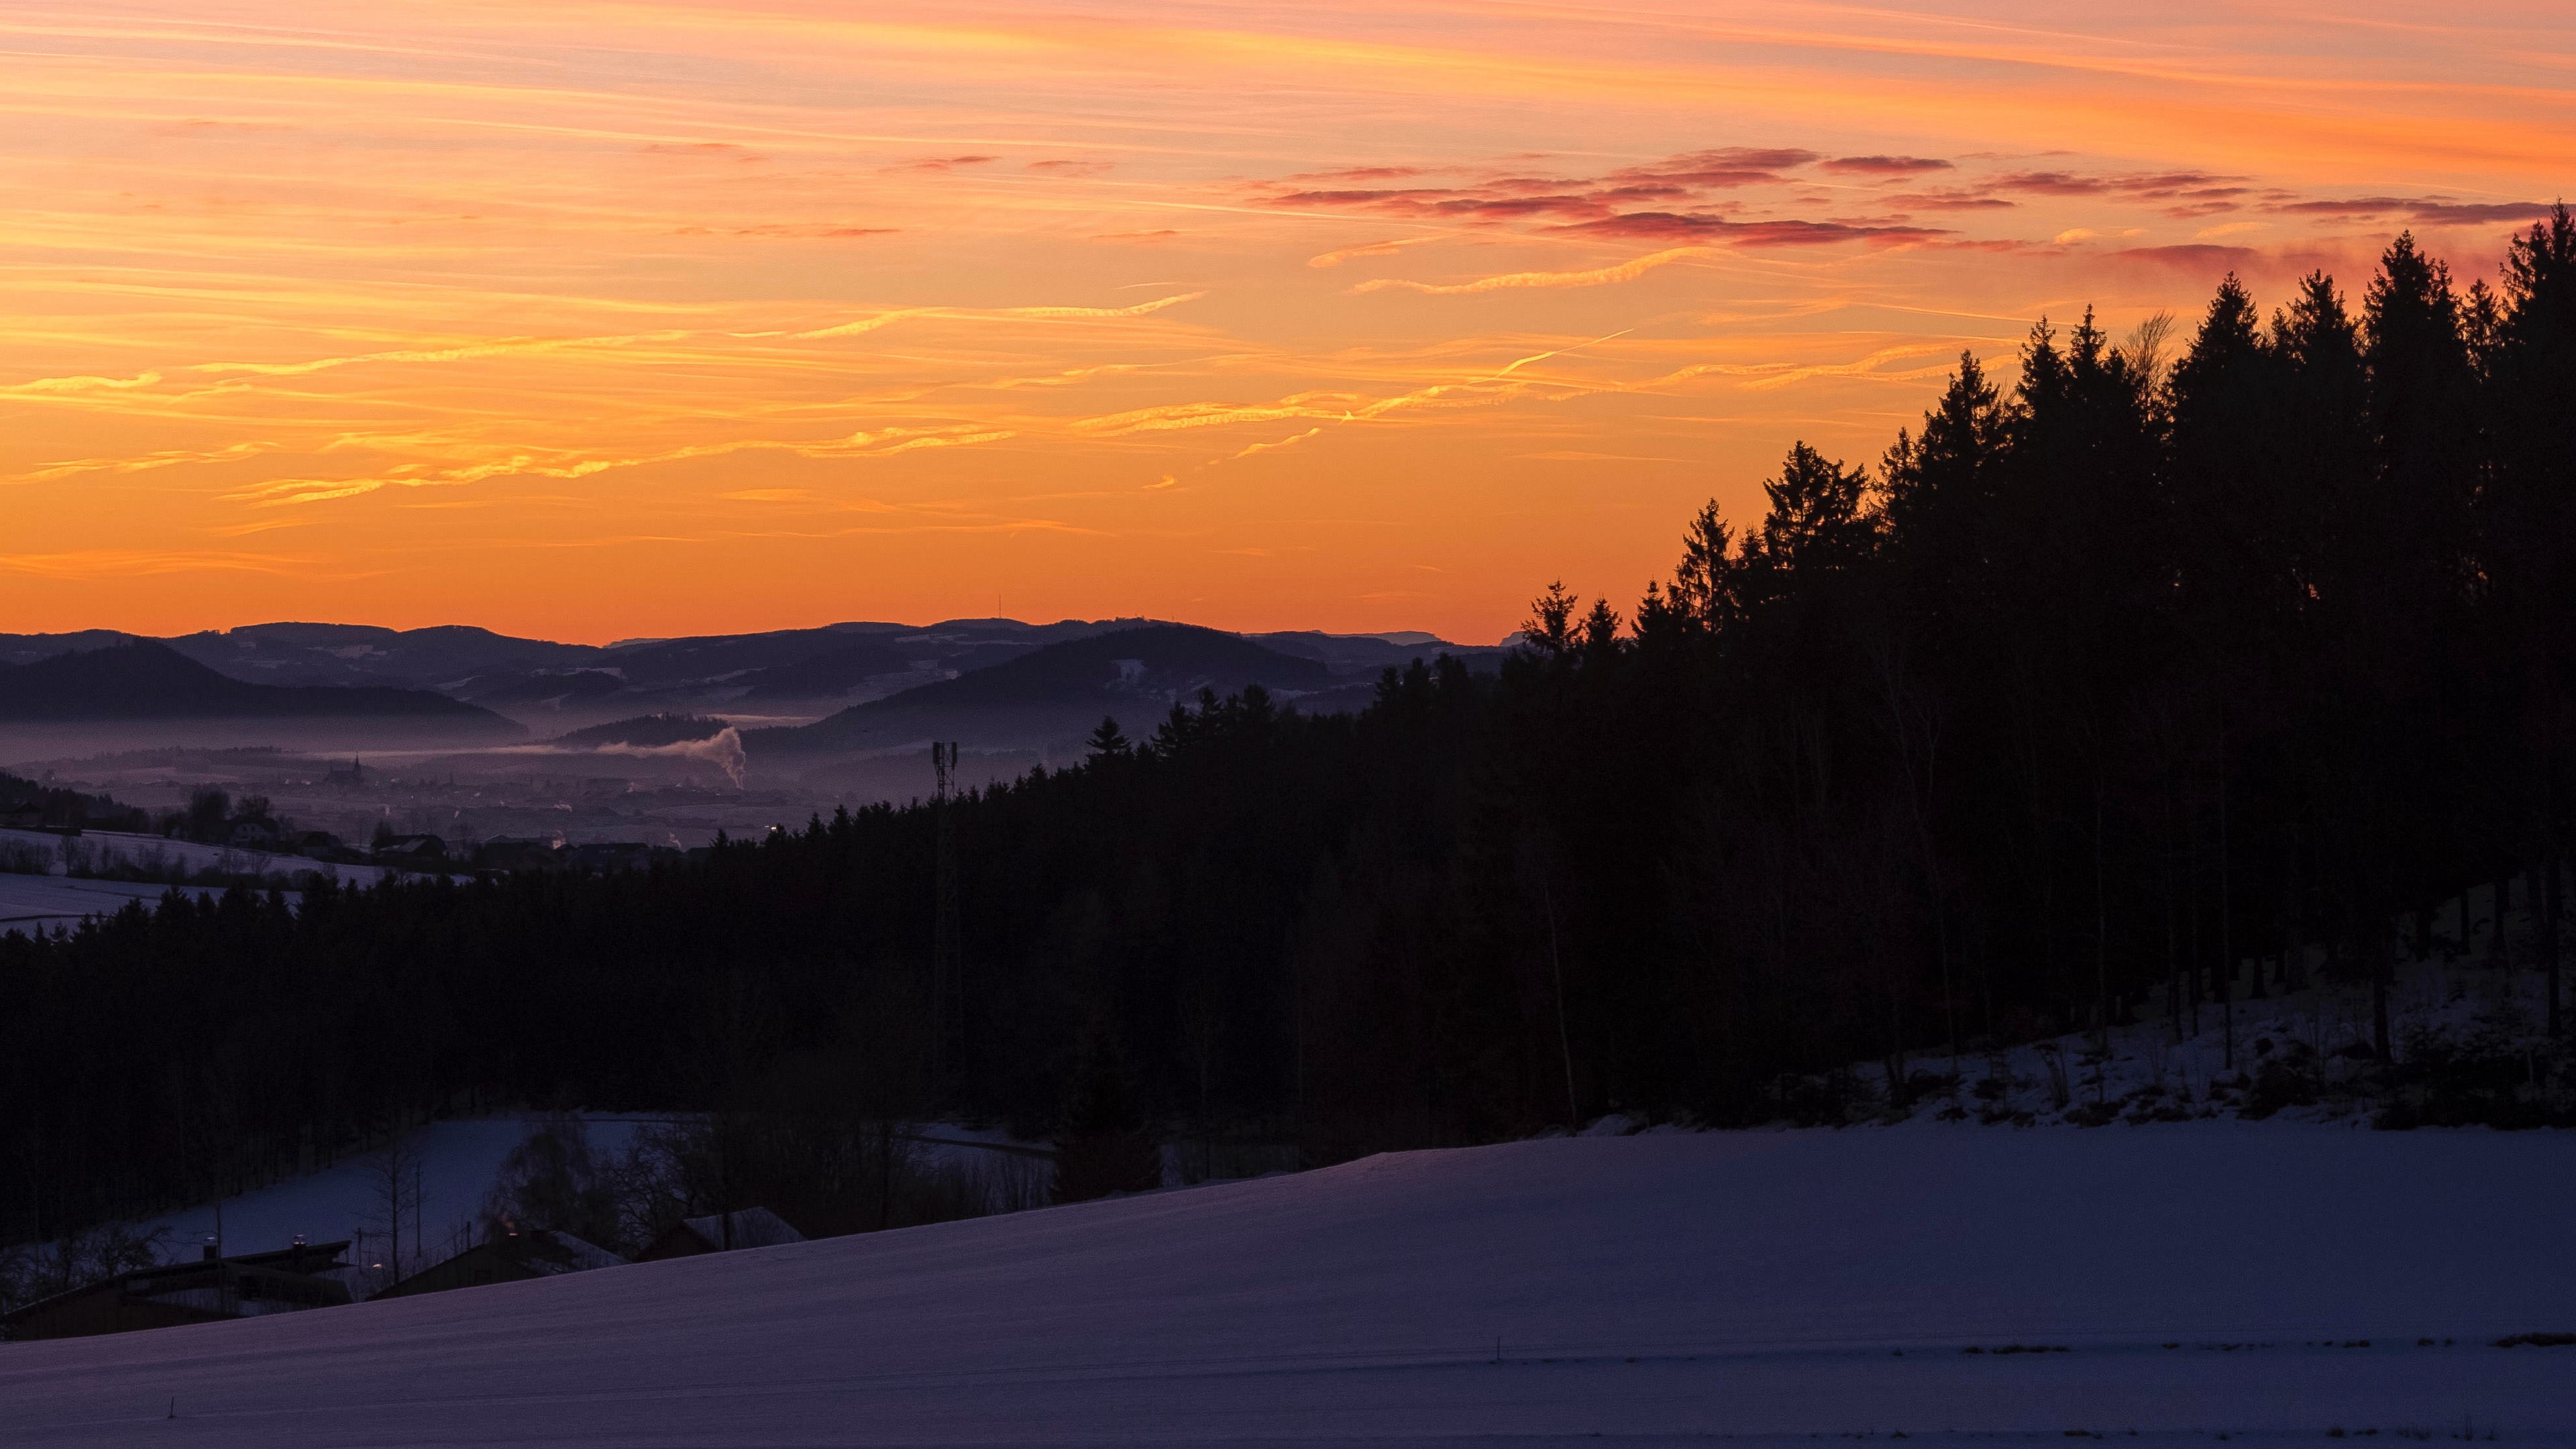 sky trees dawn snow clouds 4k 1541114153 - sky, trees, dawn, snow, clouds 4k - Trees, Sky, Dawn